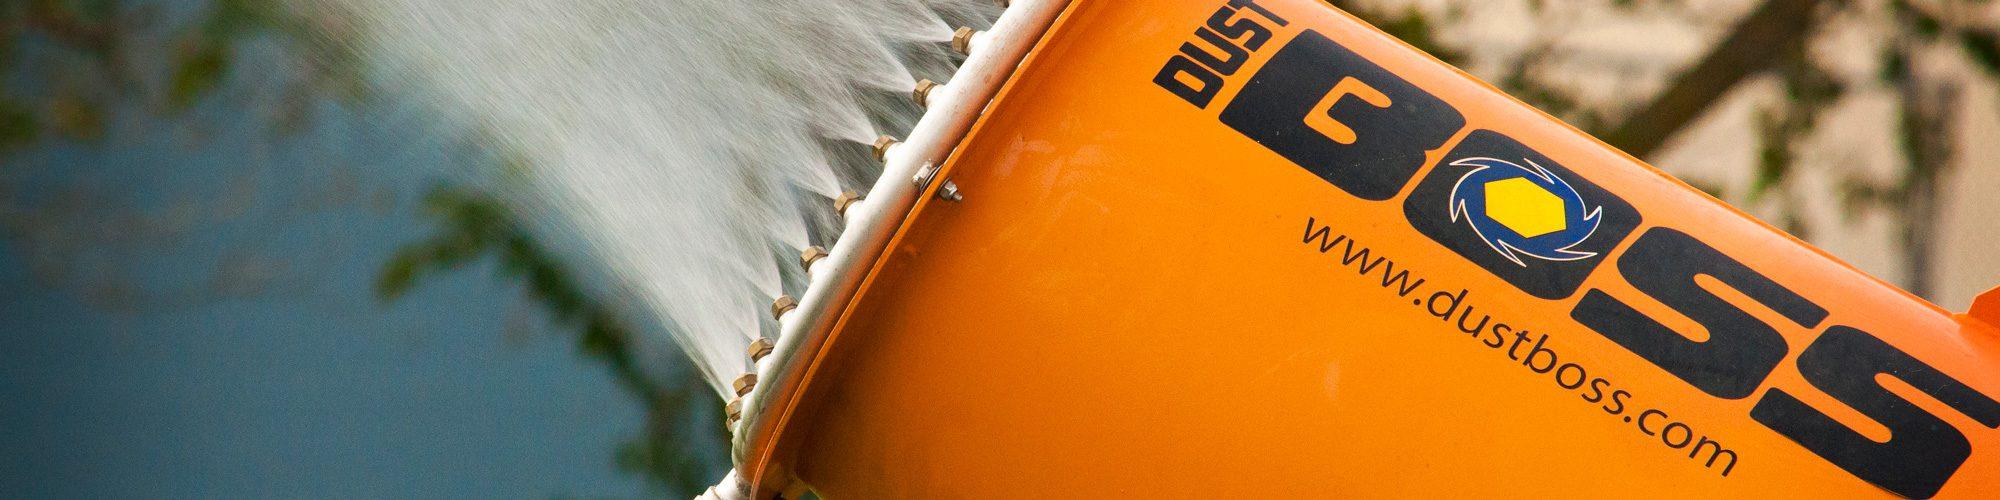 Longest Dust Control Parts Warranty